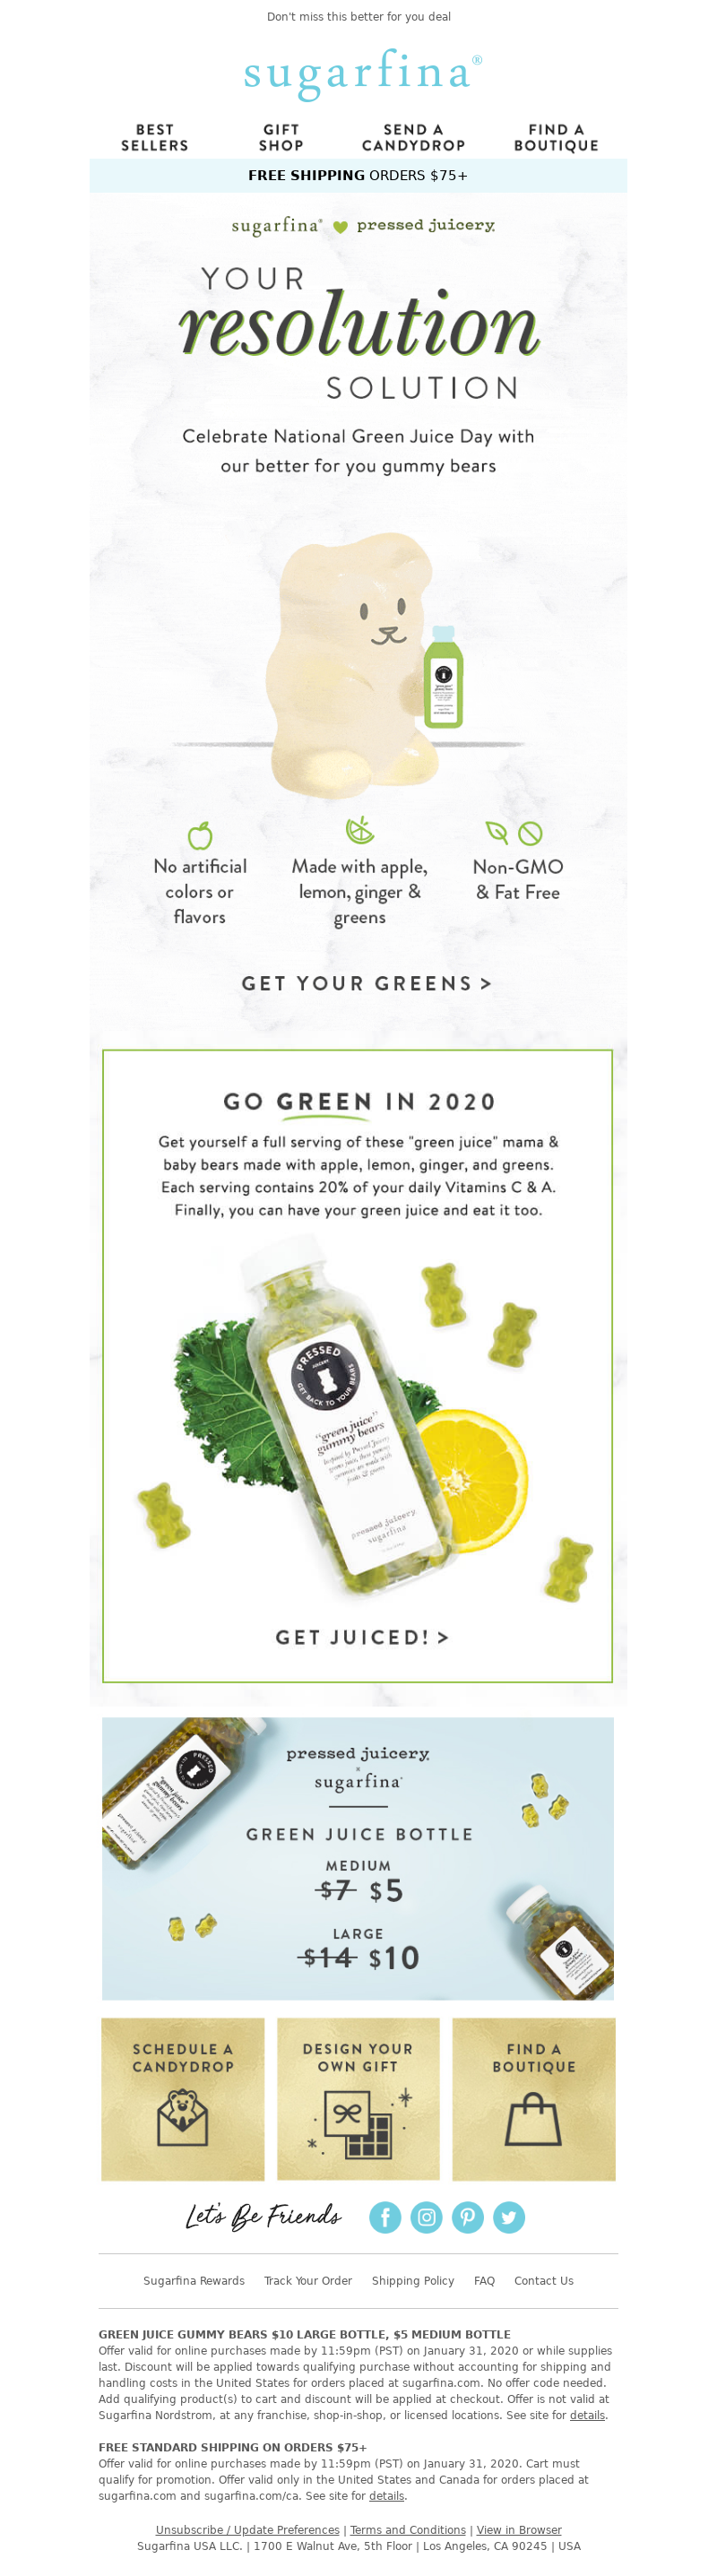 Sugarfina - It's National Green Juice Day 🍏